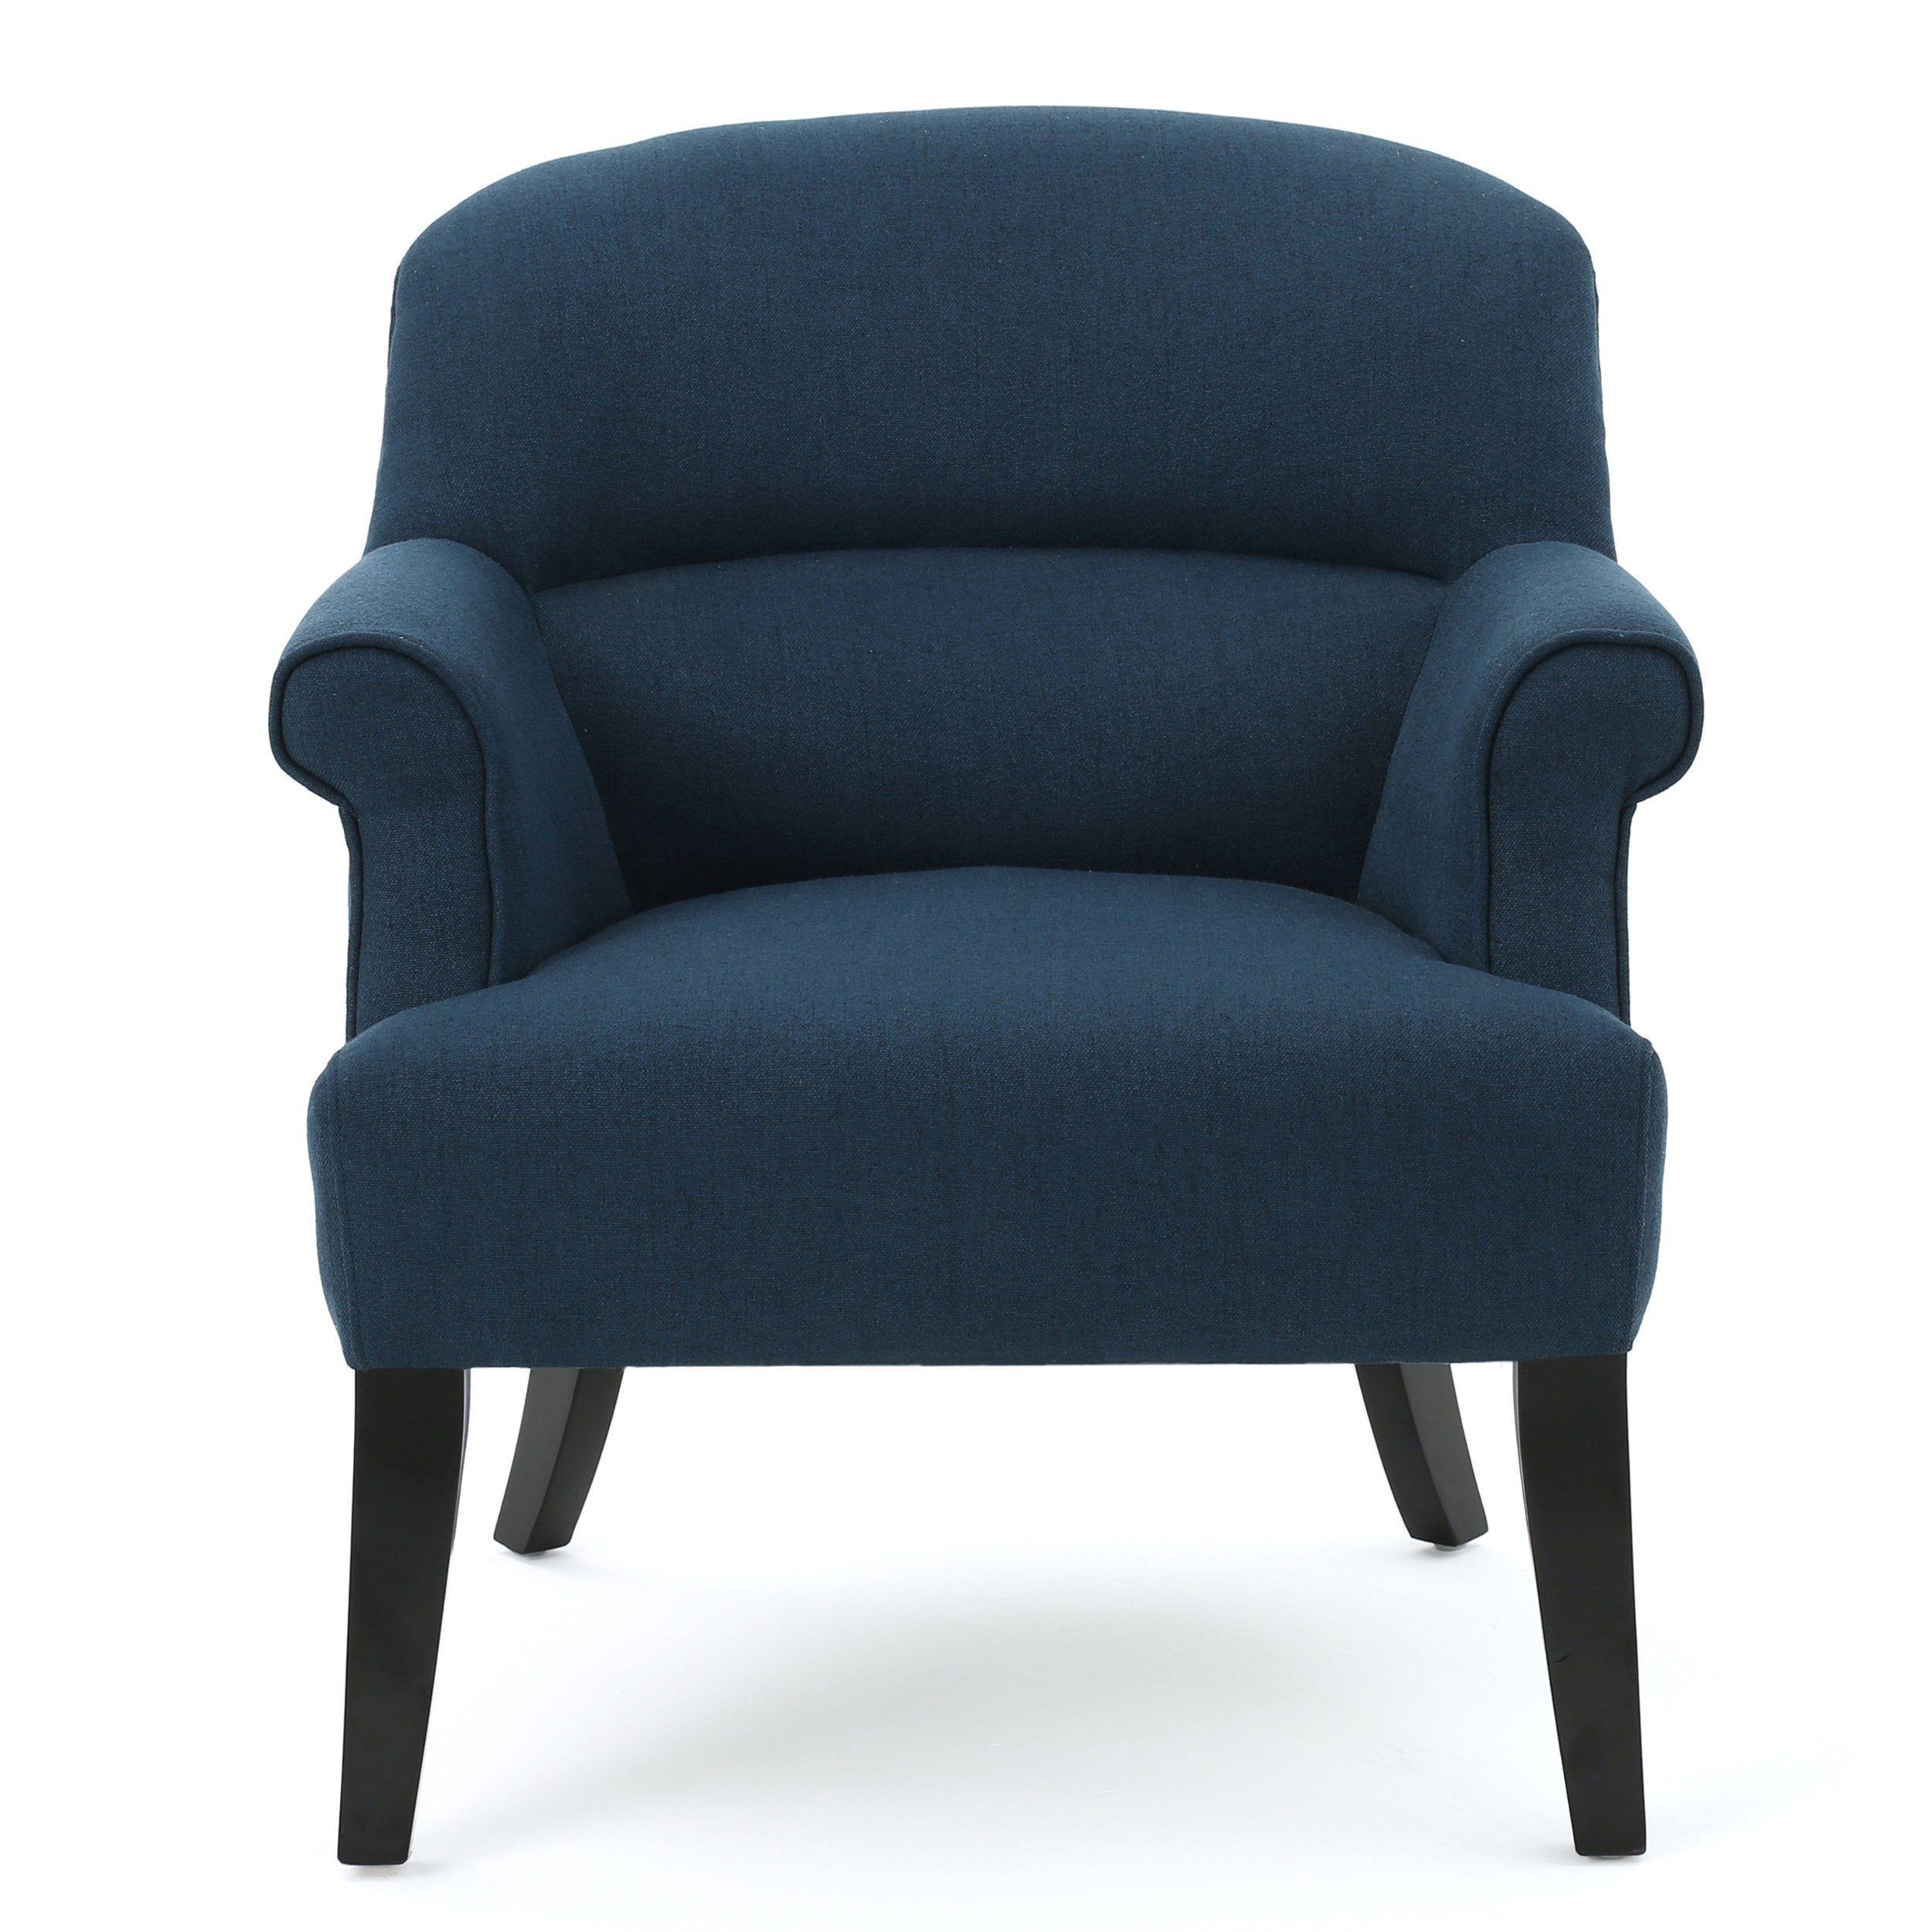 Stoff Club Stuhl | Stühle | Pinterest